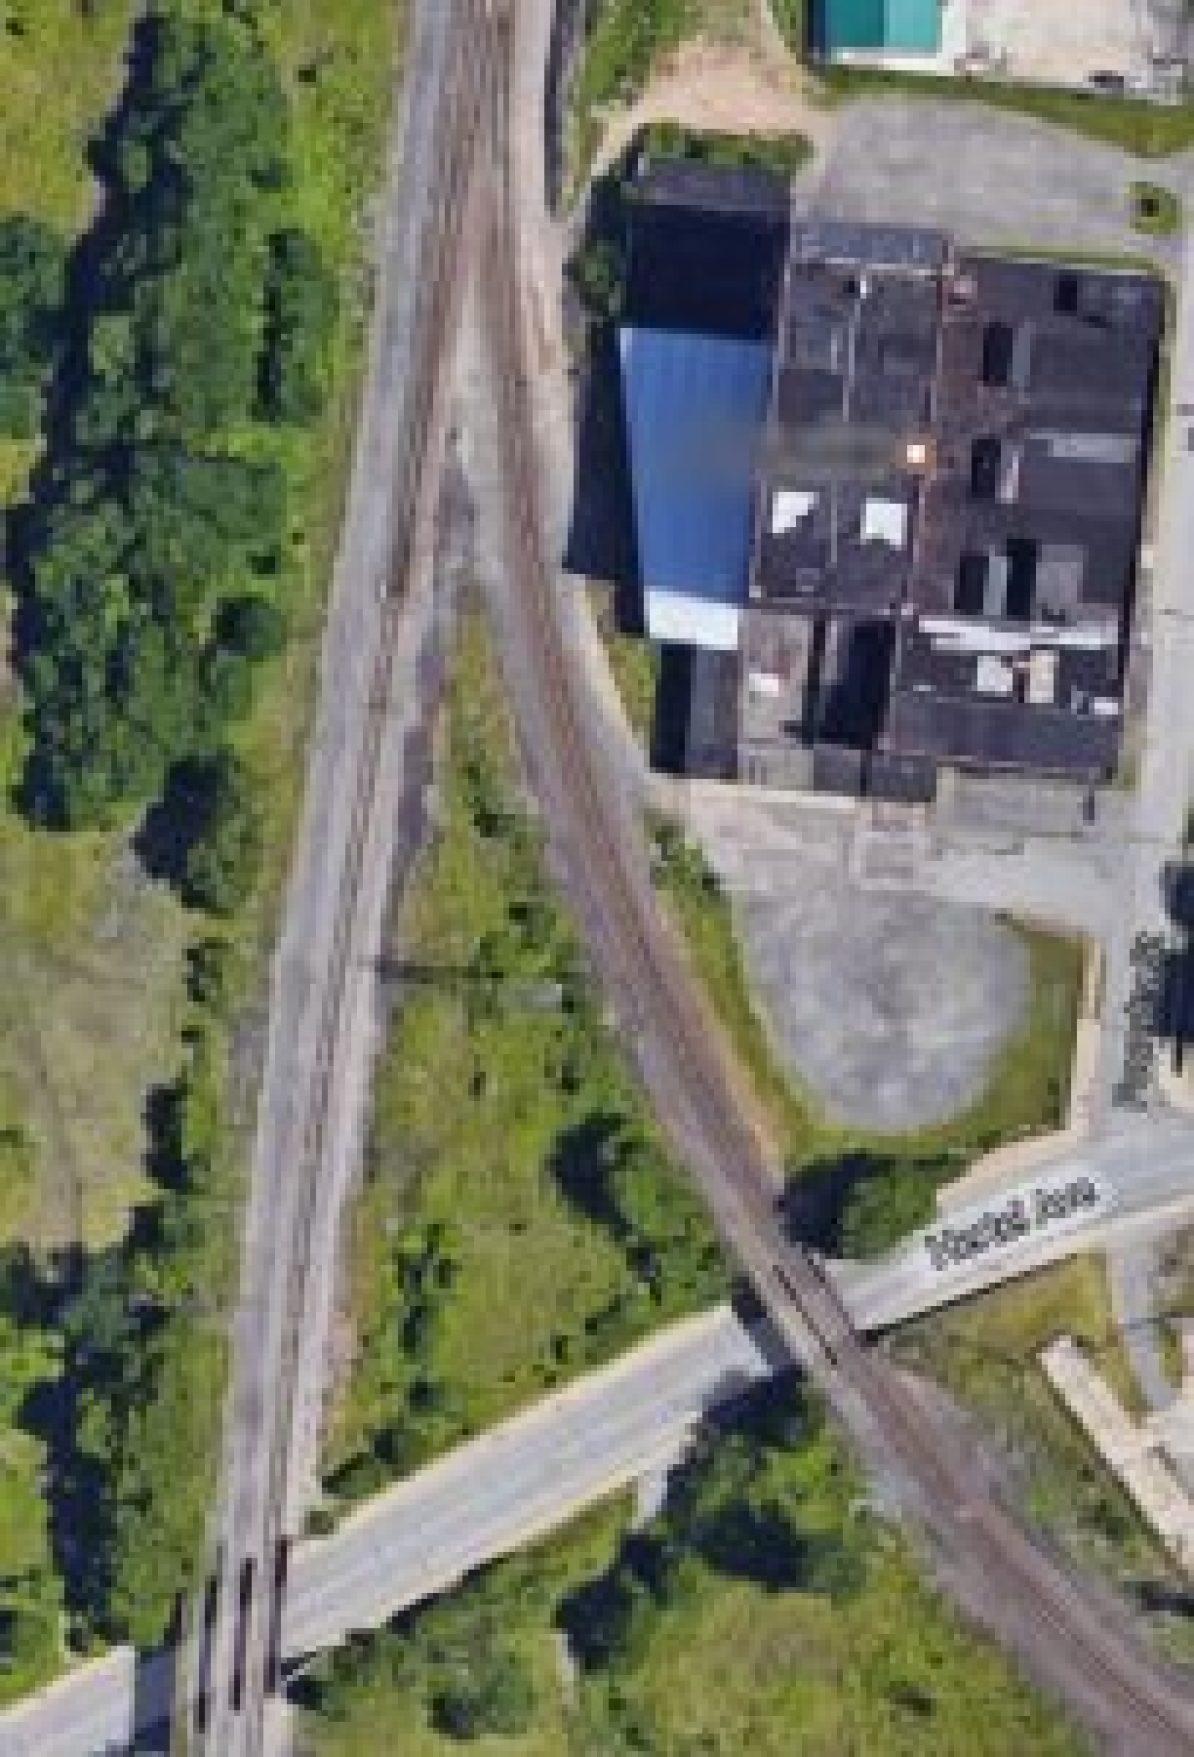 Central Terminal's Belt Line tracks meet the Exchange St. tracks at Hertel Ave.